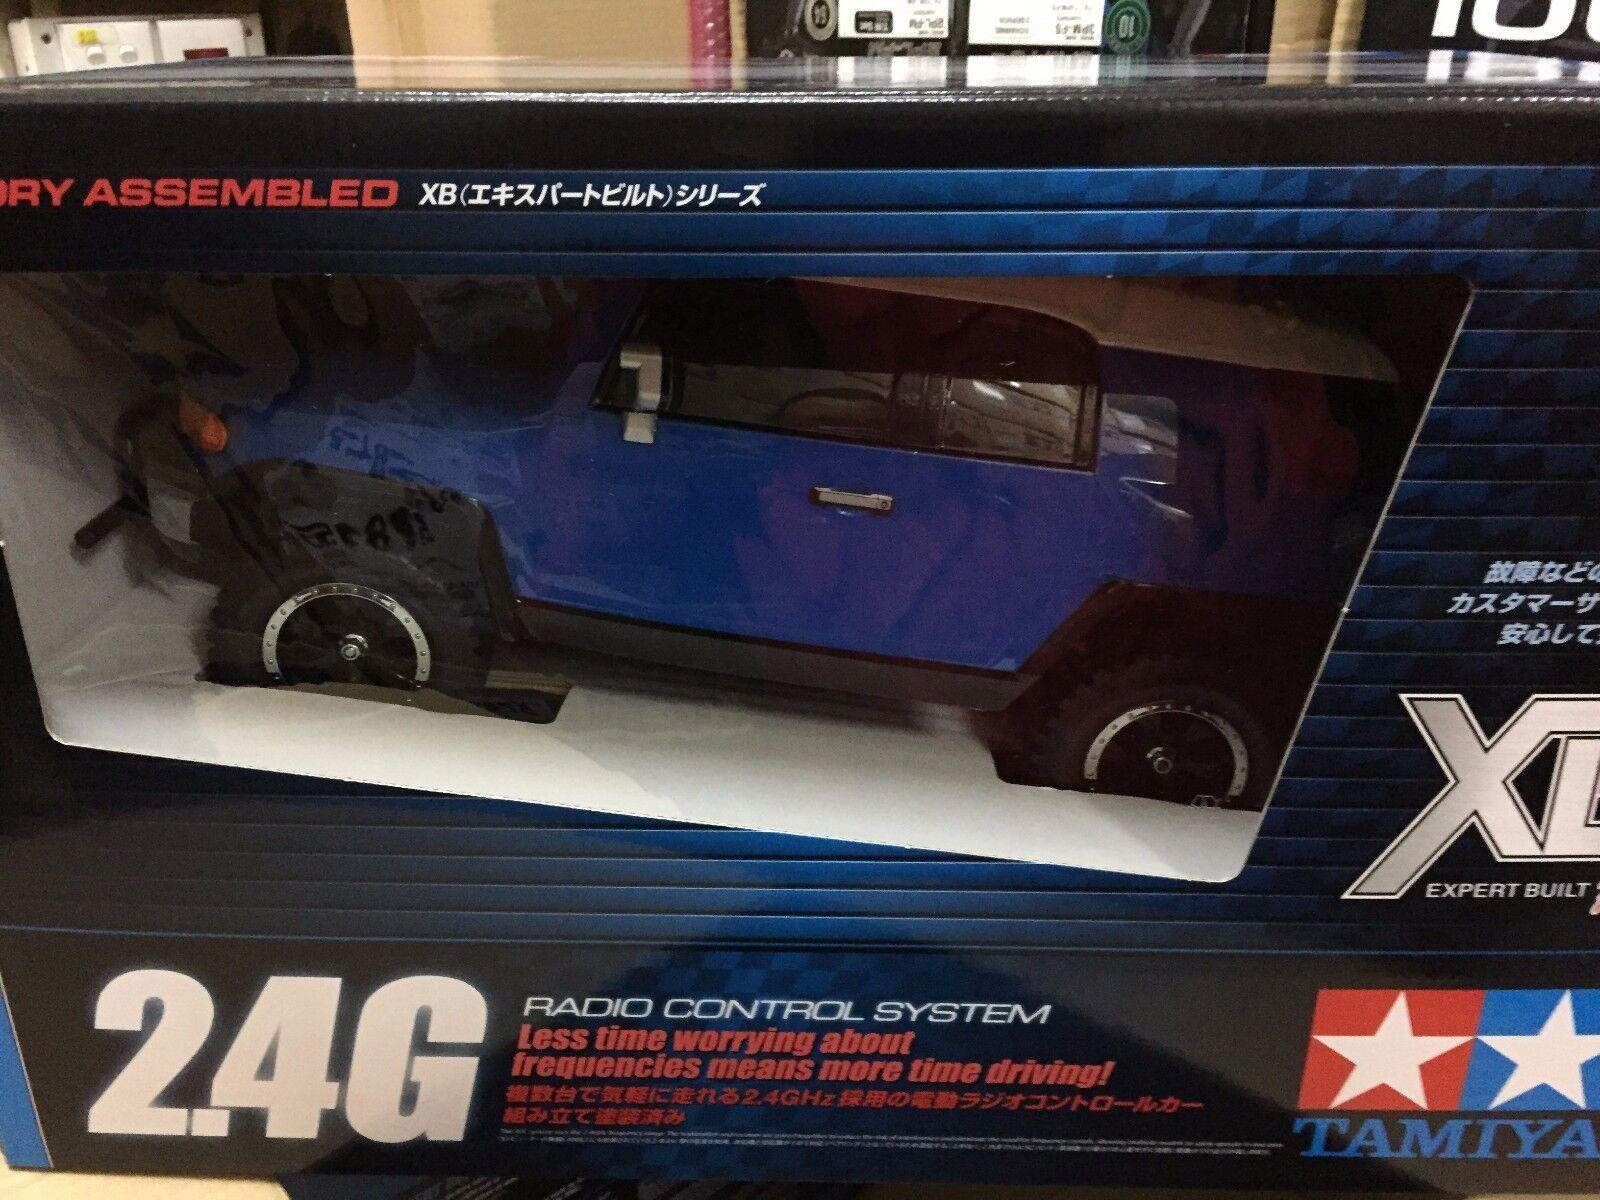 Tamiya 1  10 XB series 57877 giocattoloota FJ cruiser (CC-01 chassis) 2.4 GHz  articoli promozionali